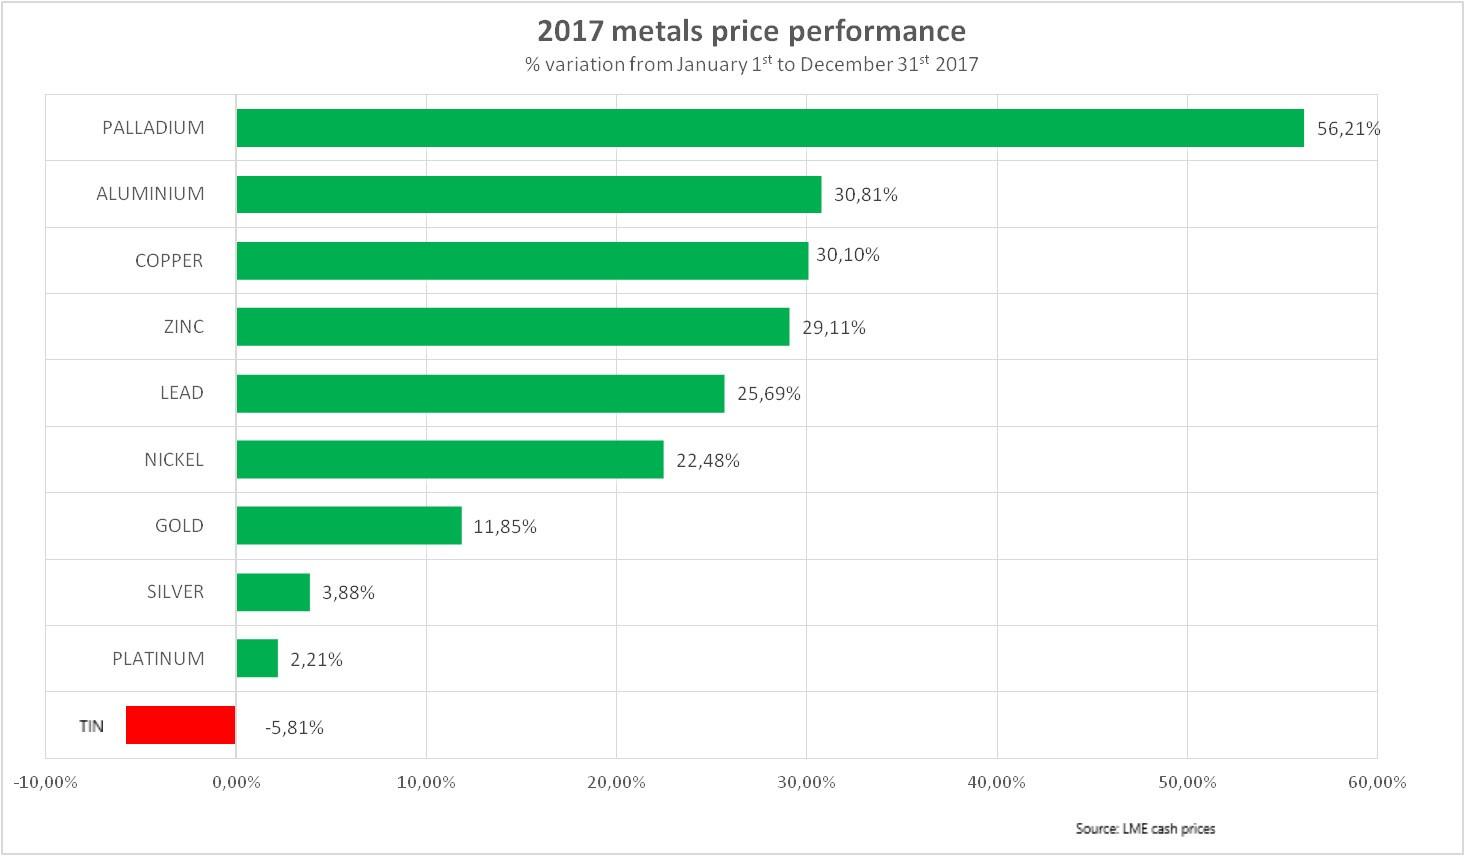 2017 price of metals performance